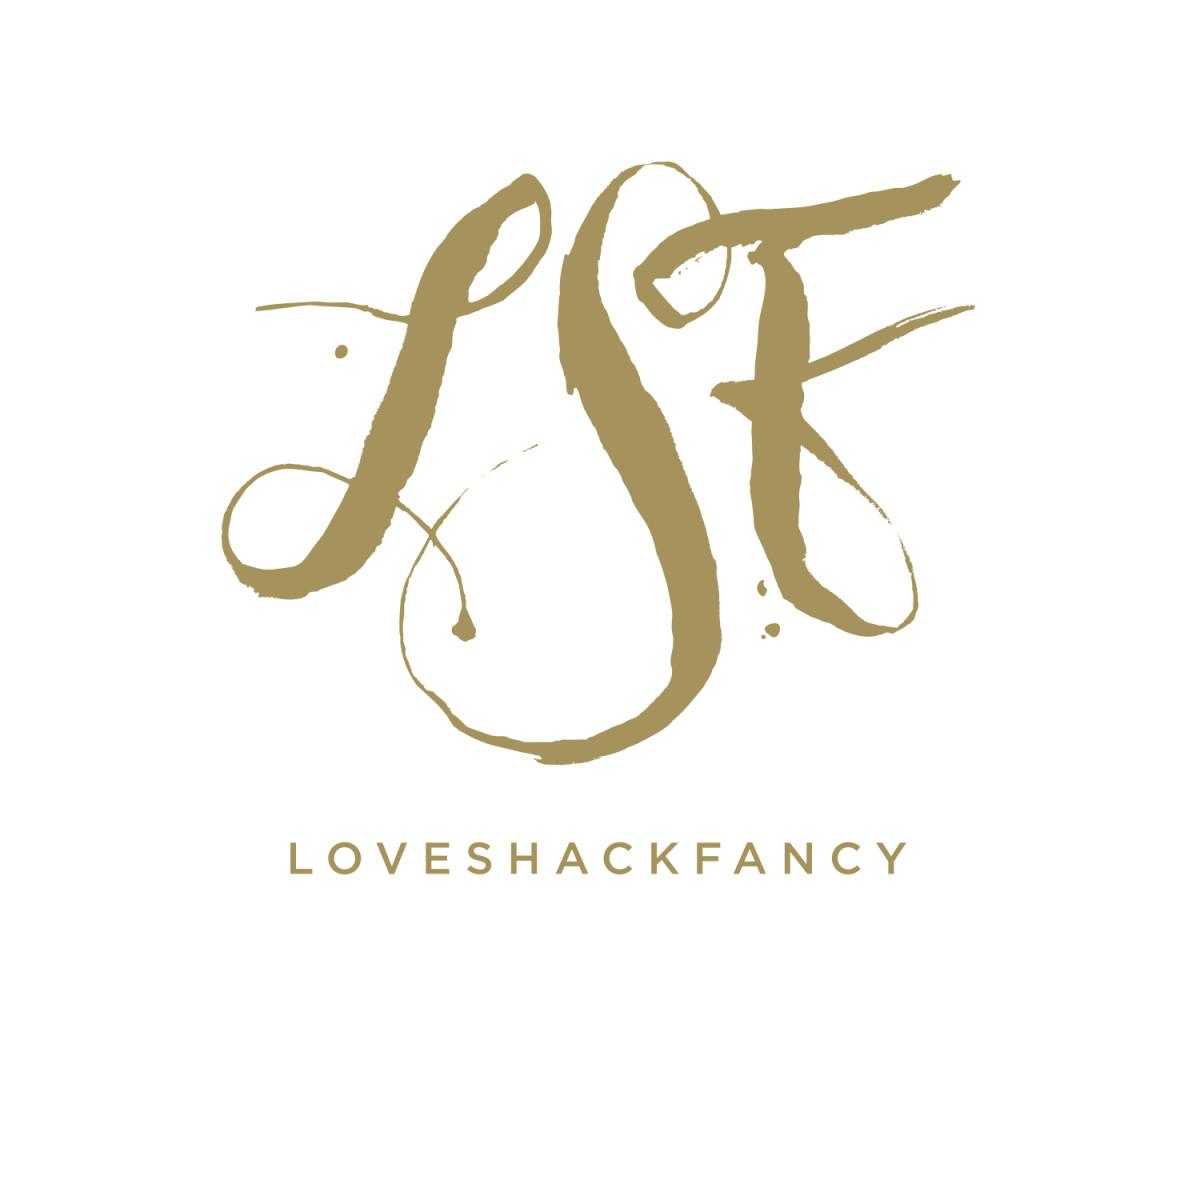 LSF_logo_gold.jpg